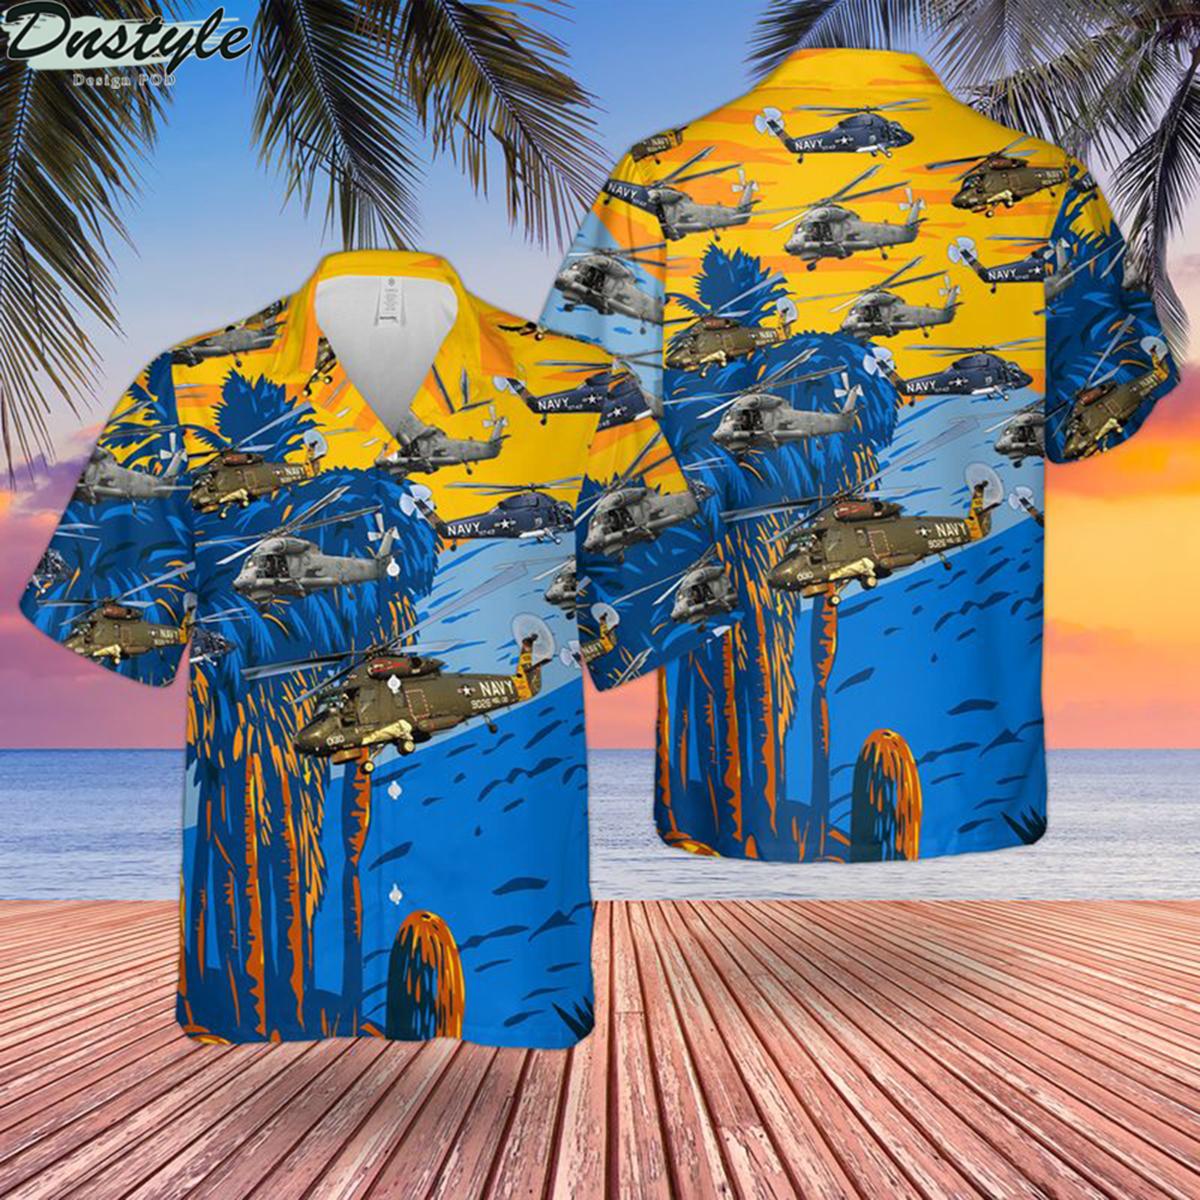 Us navy kaman sh-2 seasprite hawaiian shirt 2